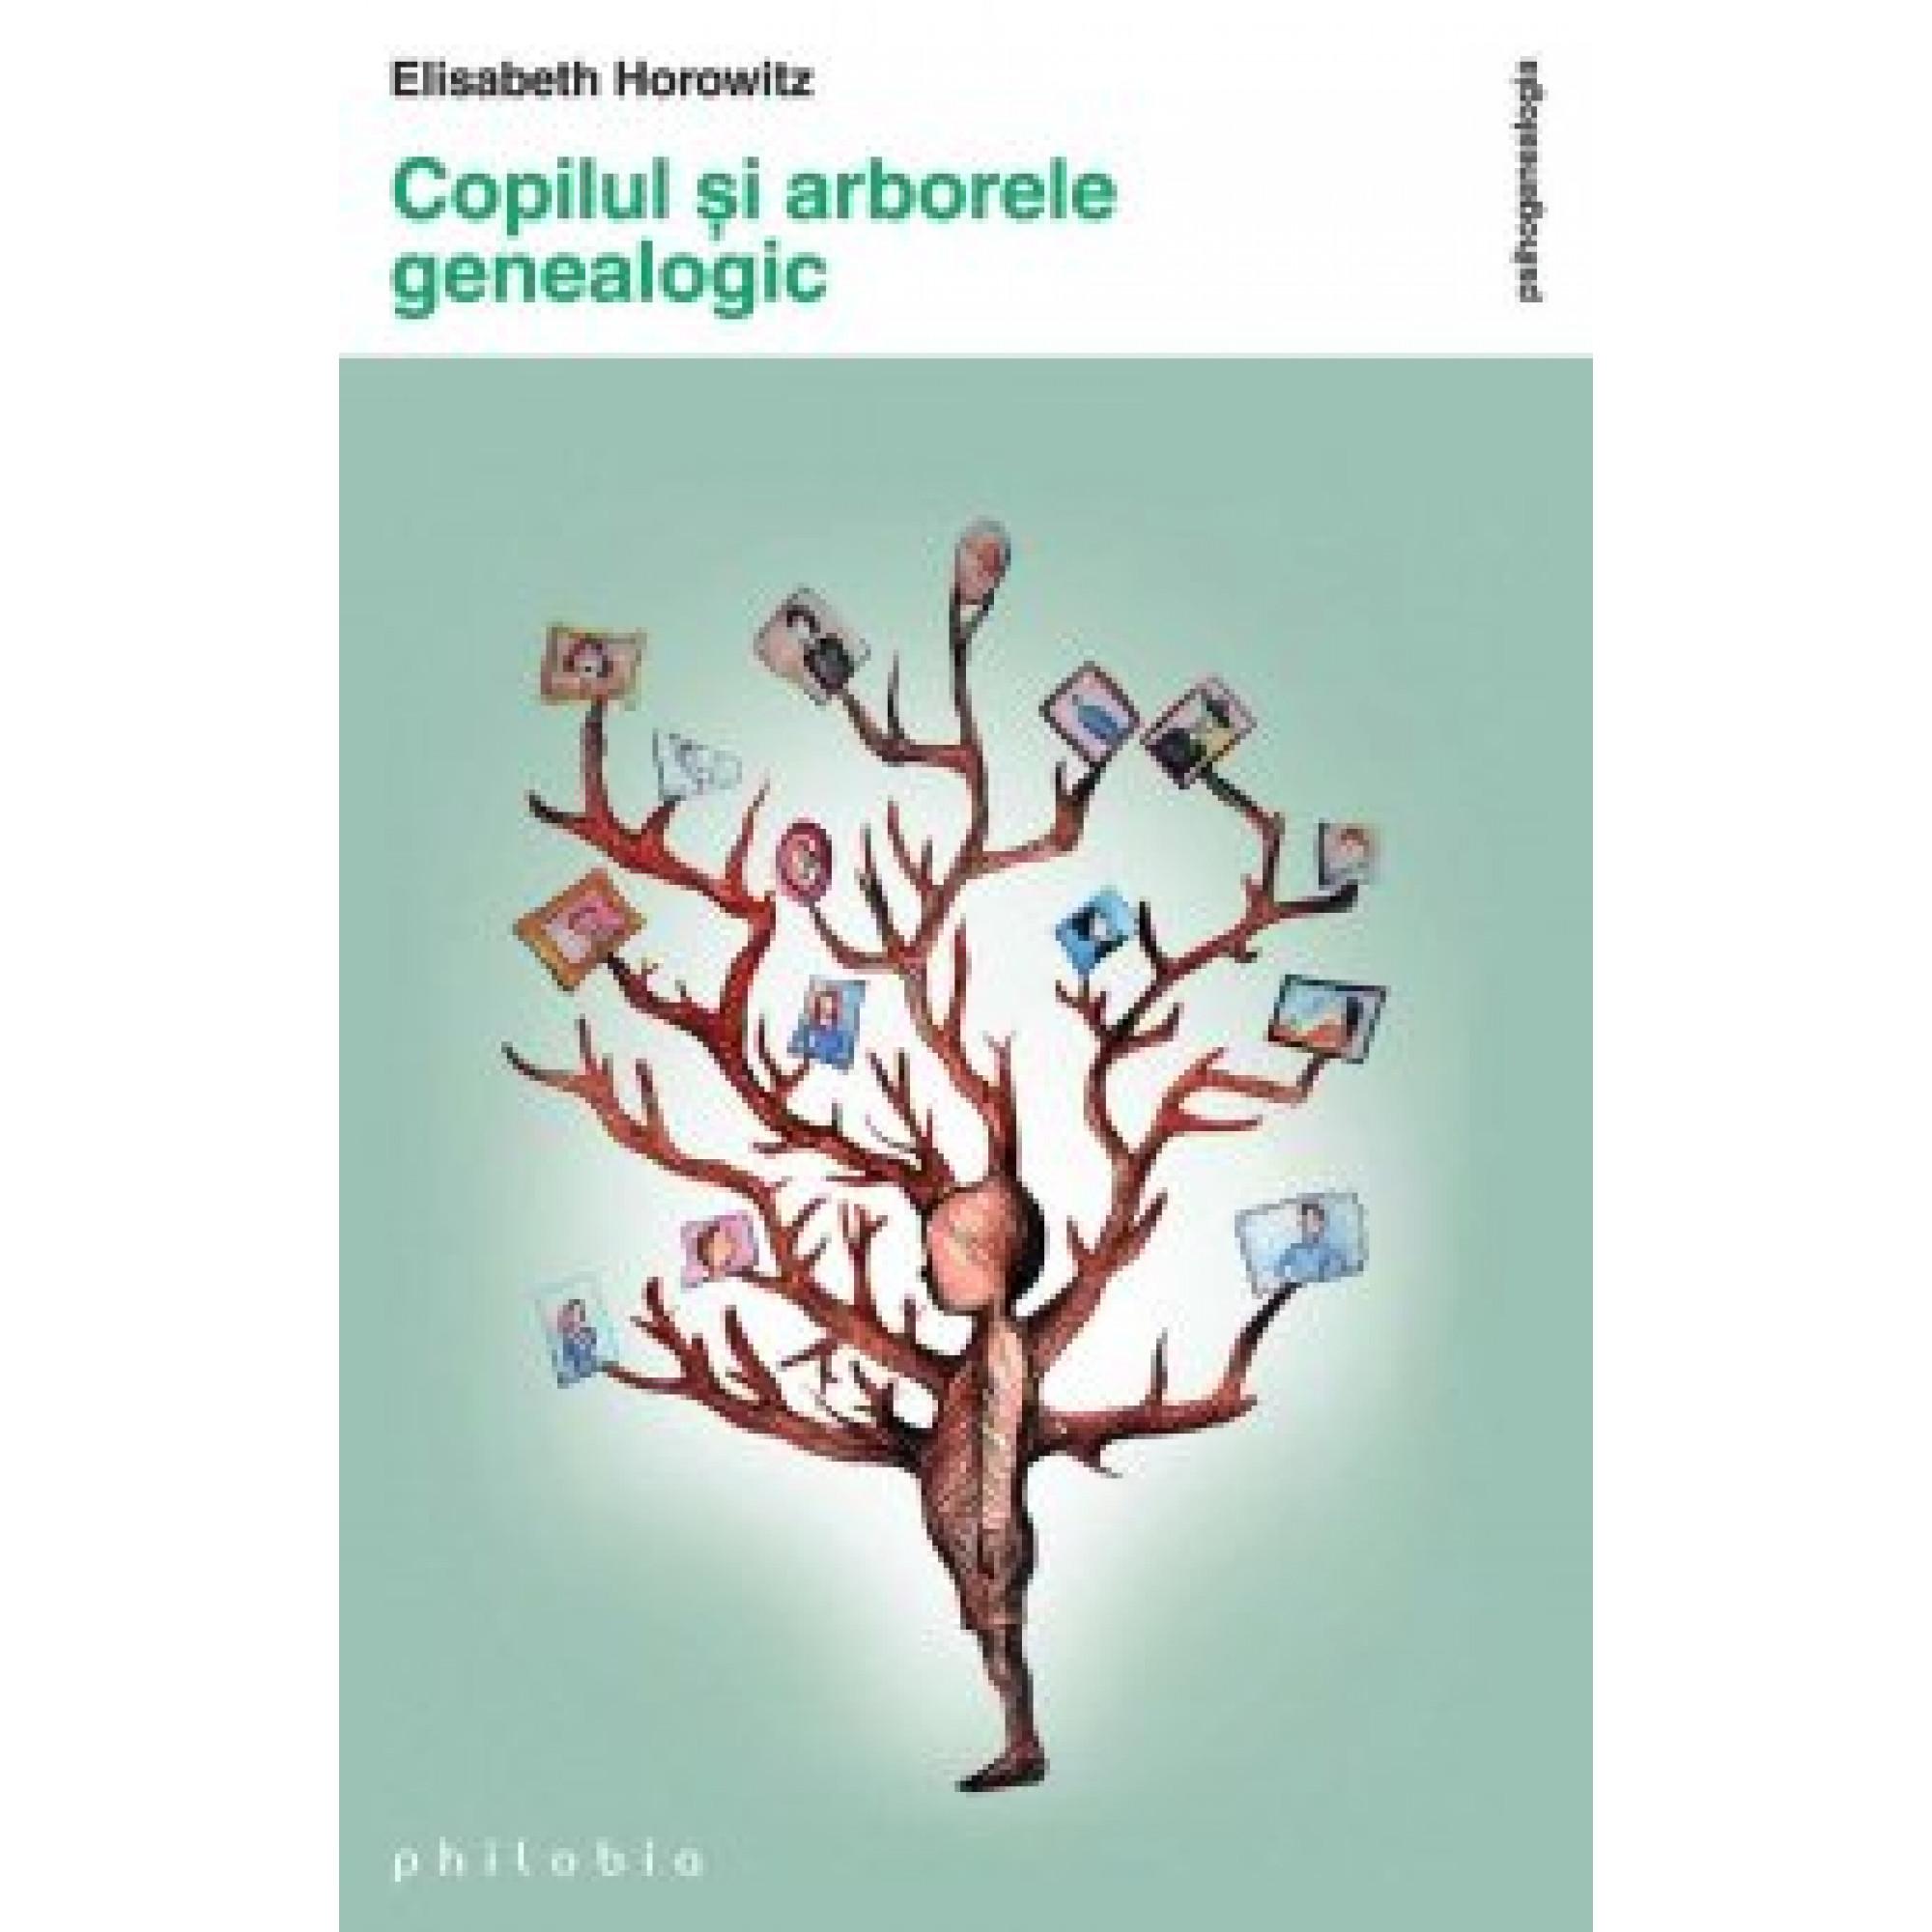 Copilul și arborele genealogic; Elisabeth Horowitz